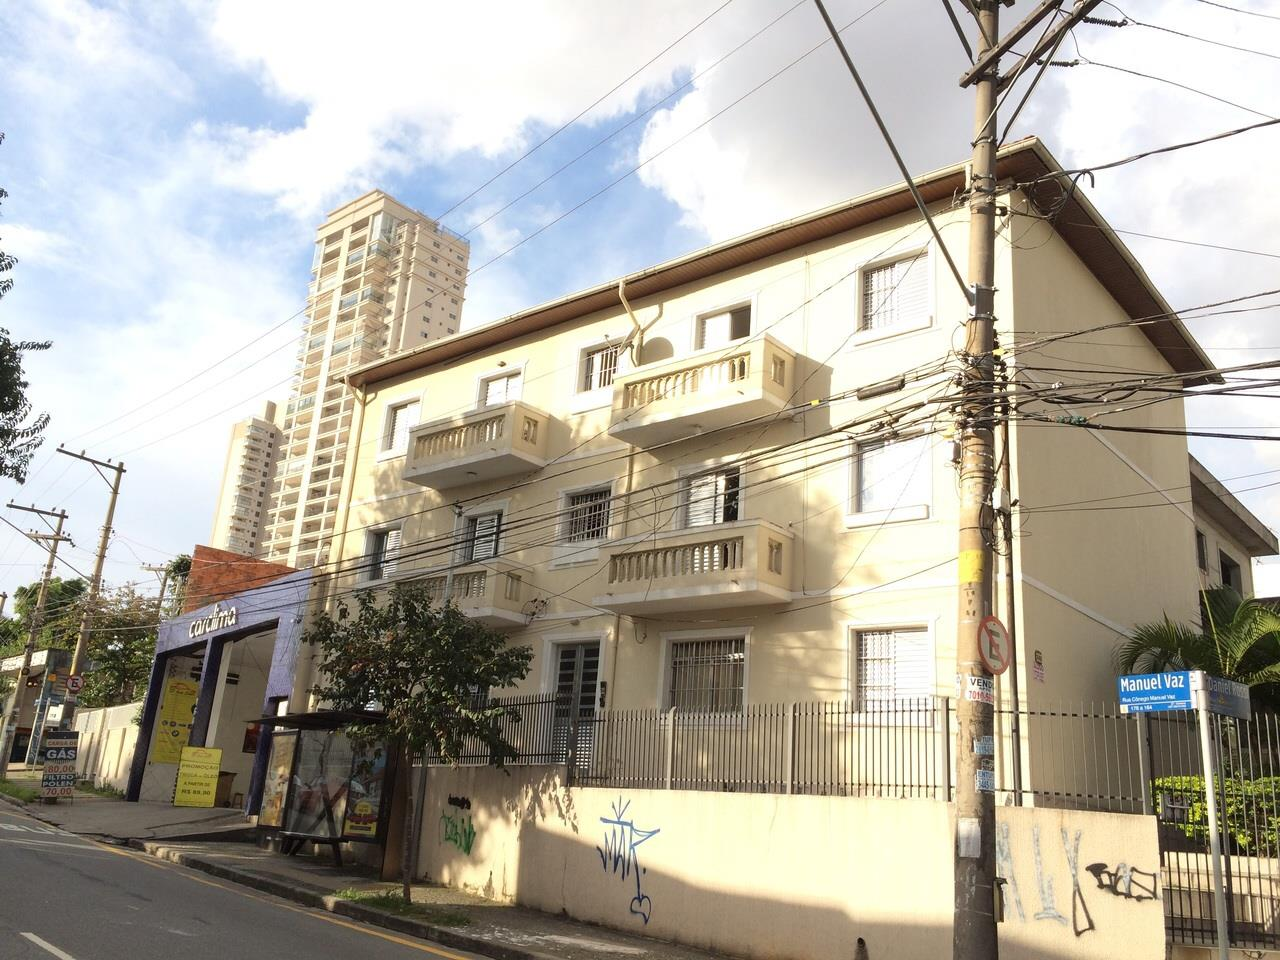 Soute Imóveis - Apto 2 Dorm, Santana, São Paulo